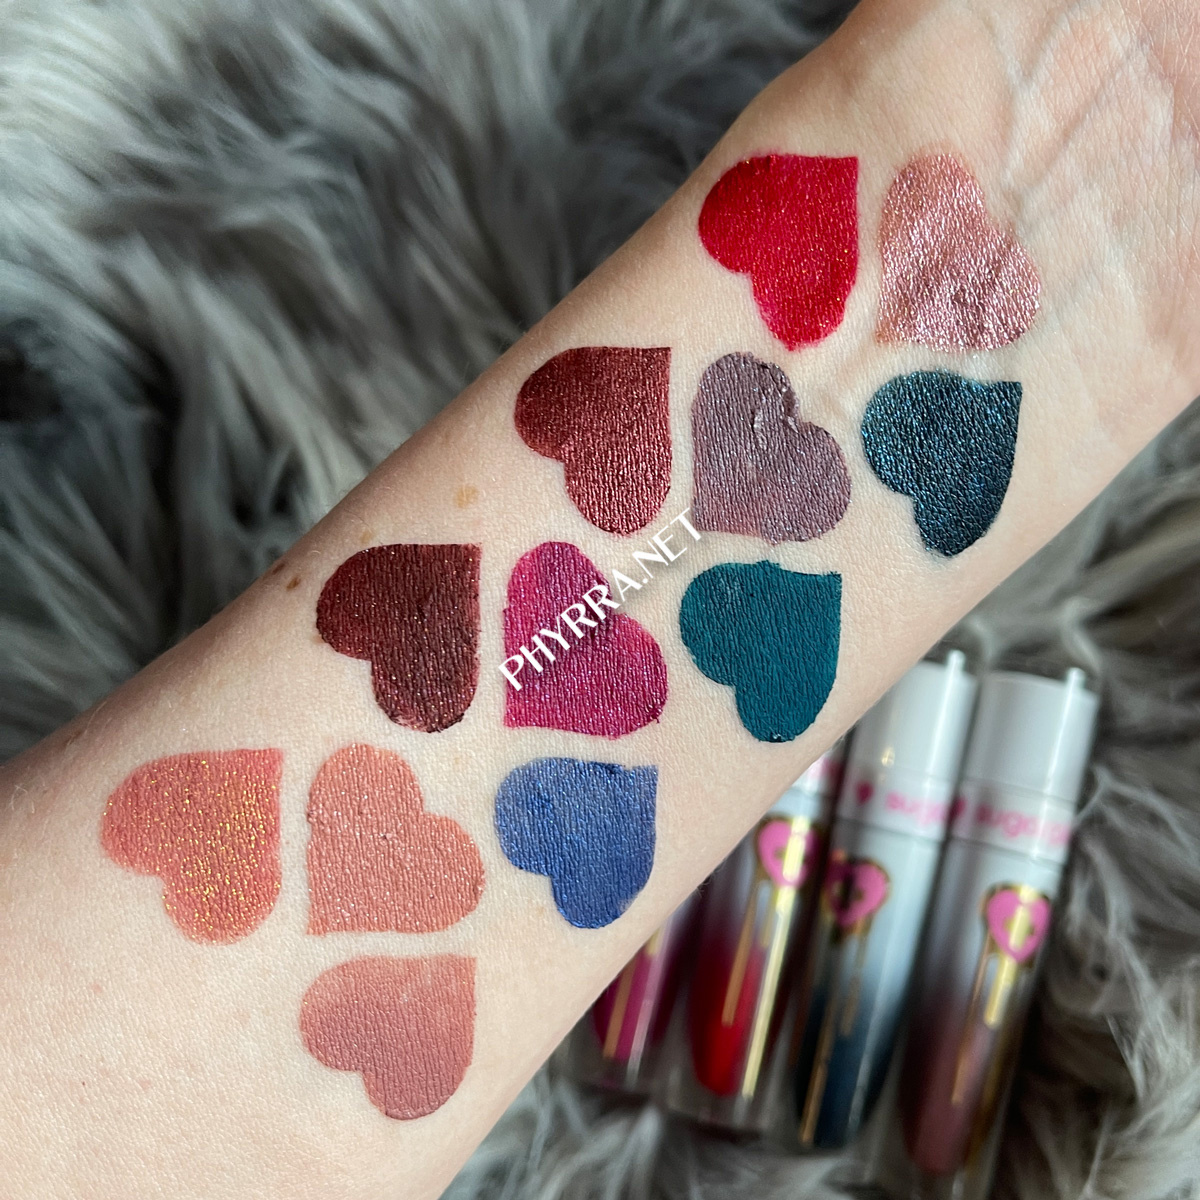 Sugarpill Liquid Lip Color Swatches